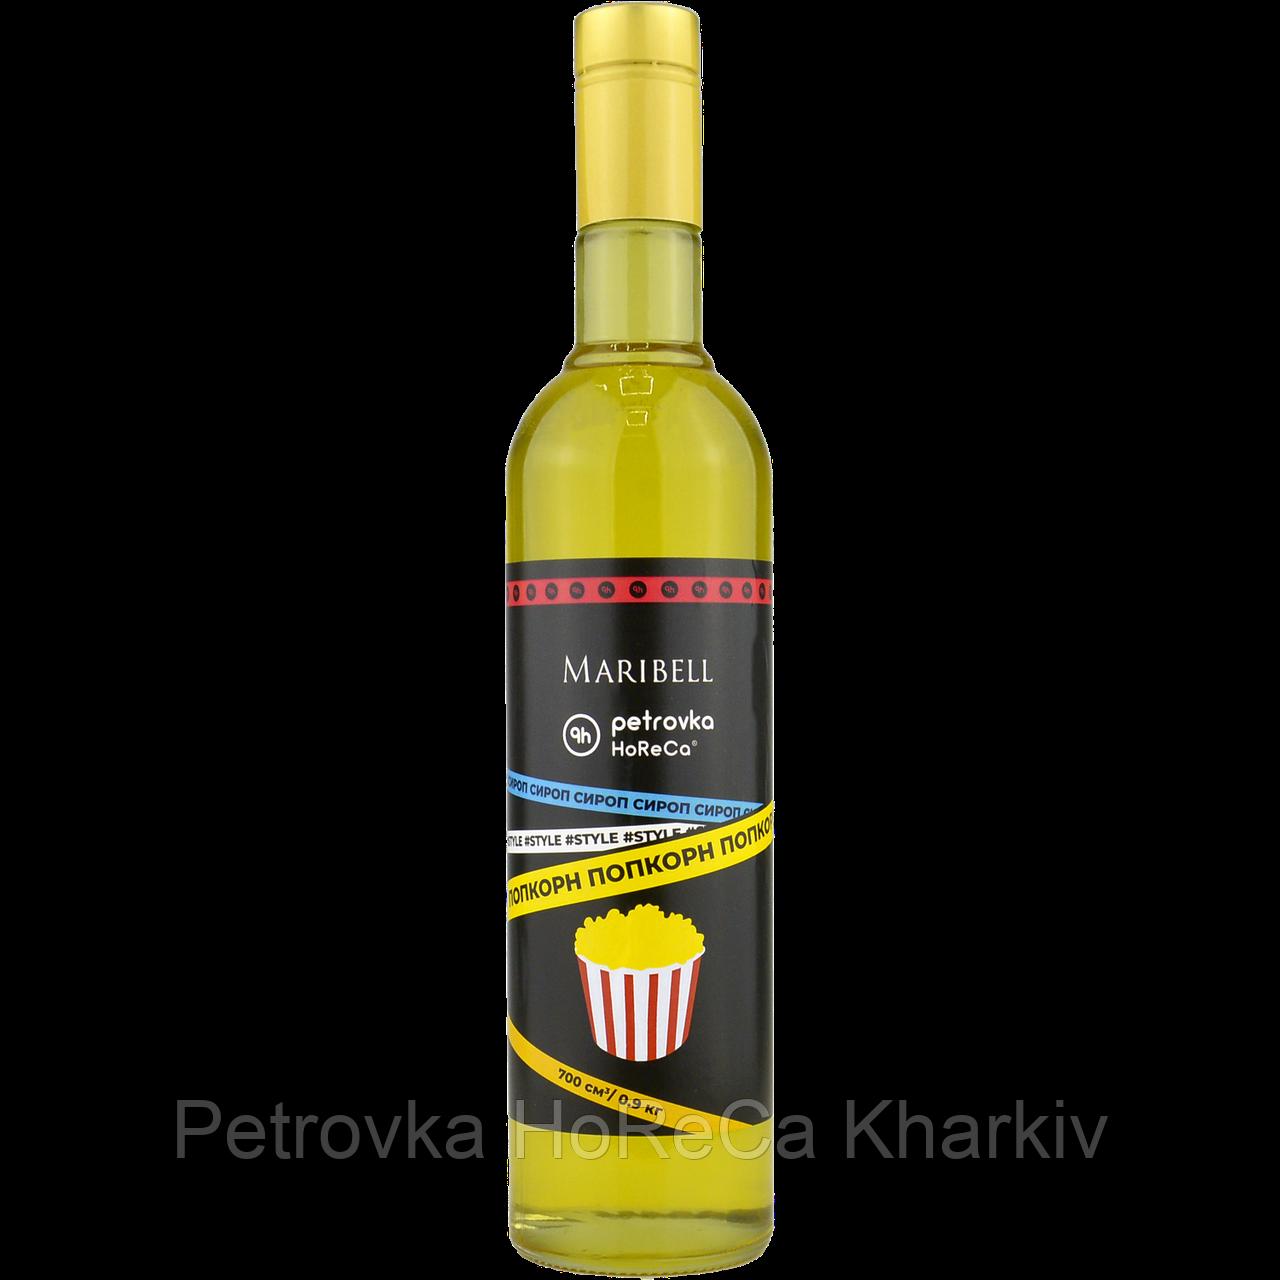 Сироп 'Поп-Корн' для коктейлей Maribell-Petrovka Horeca 700мл